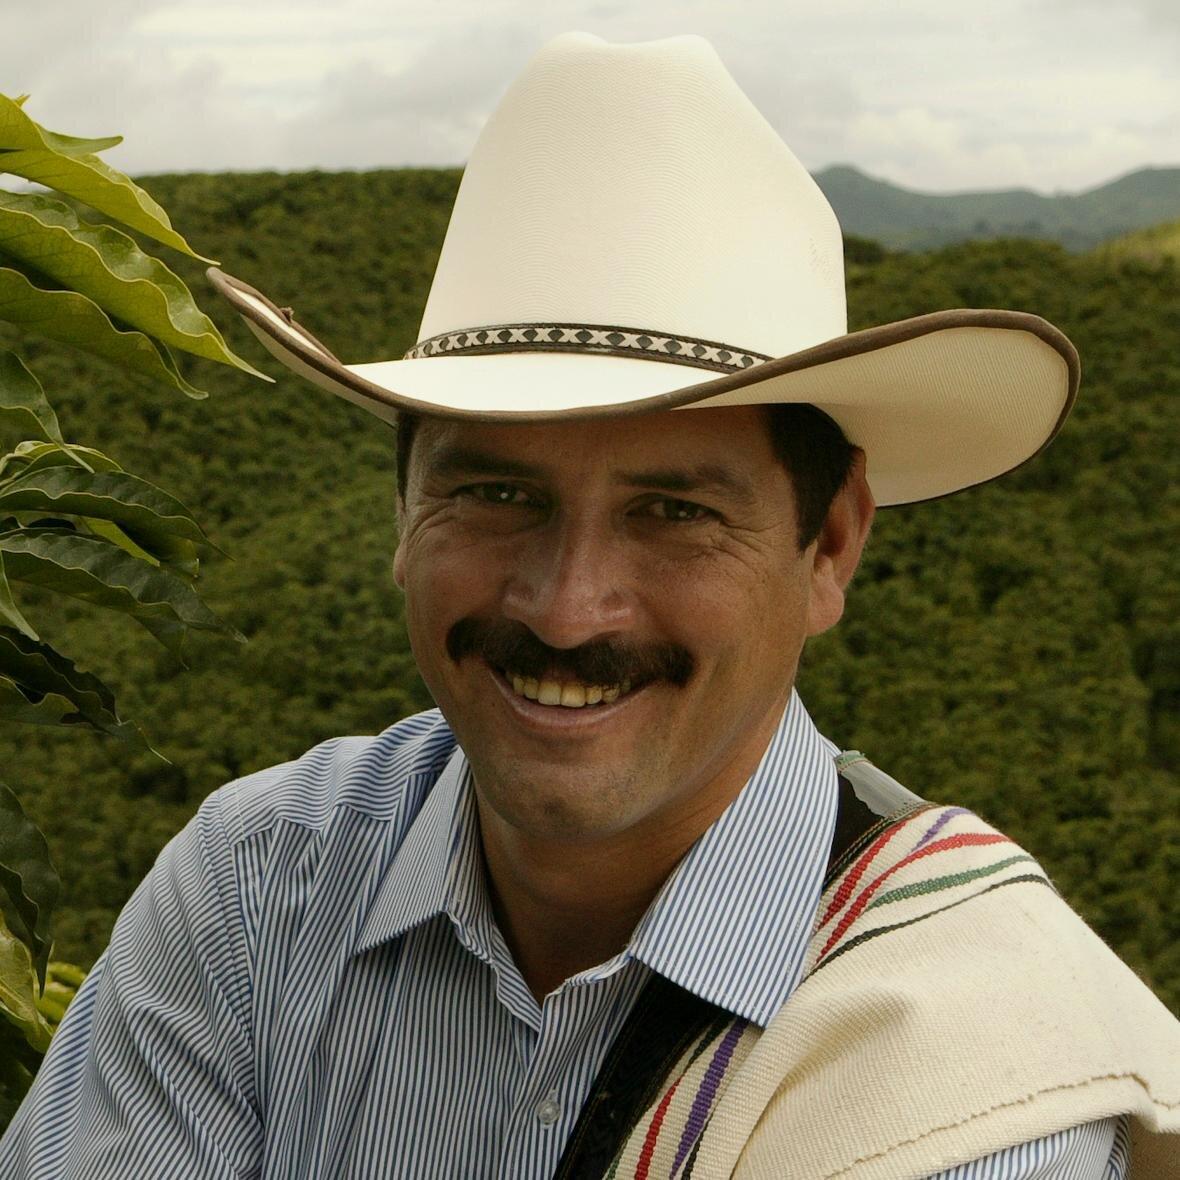 @JuanValdez